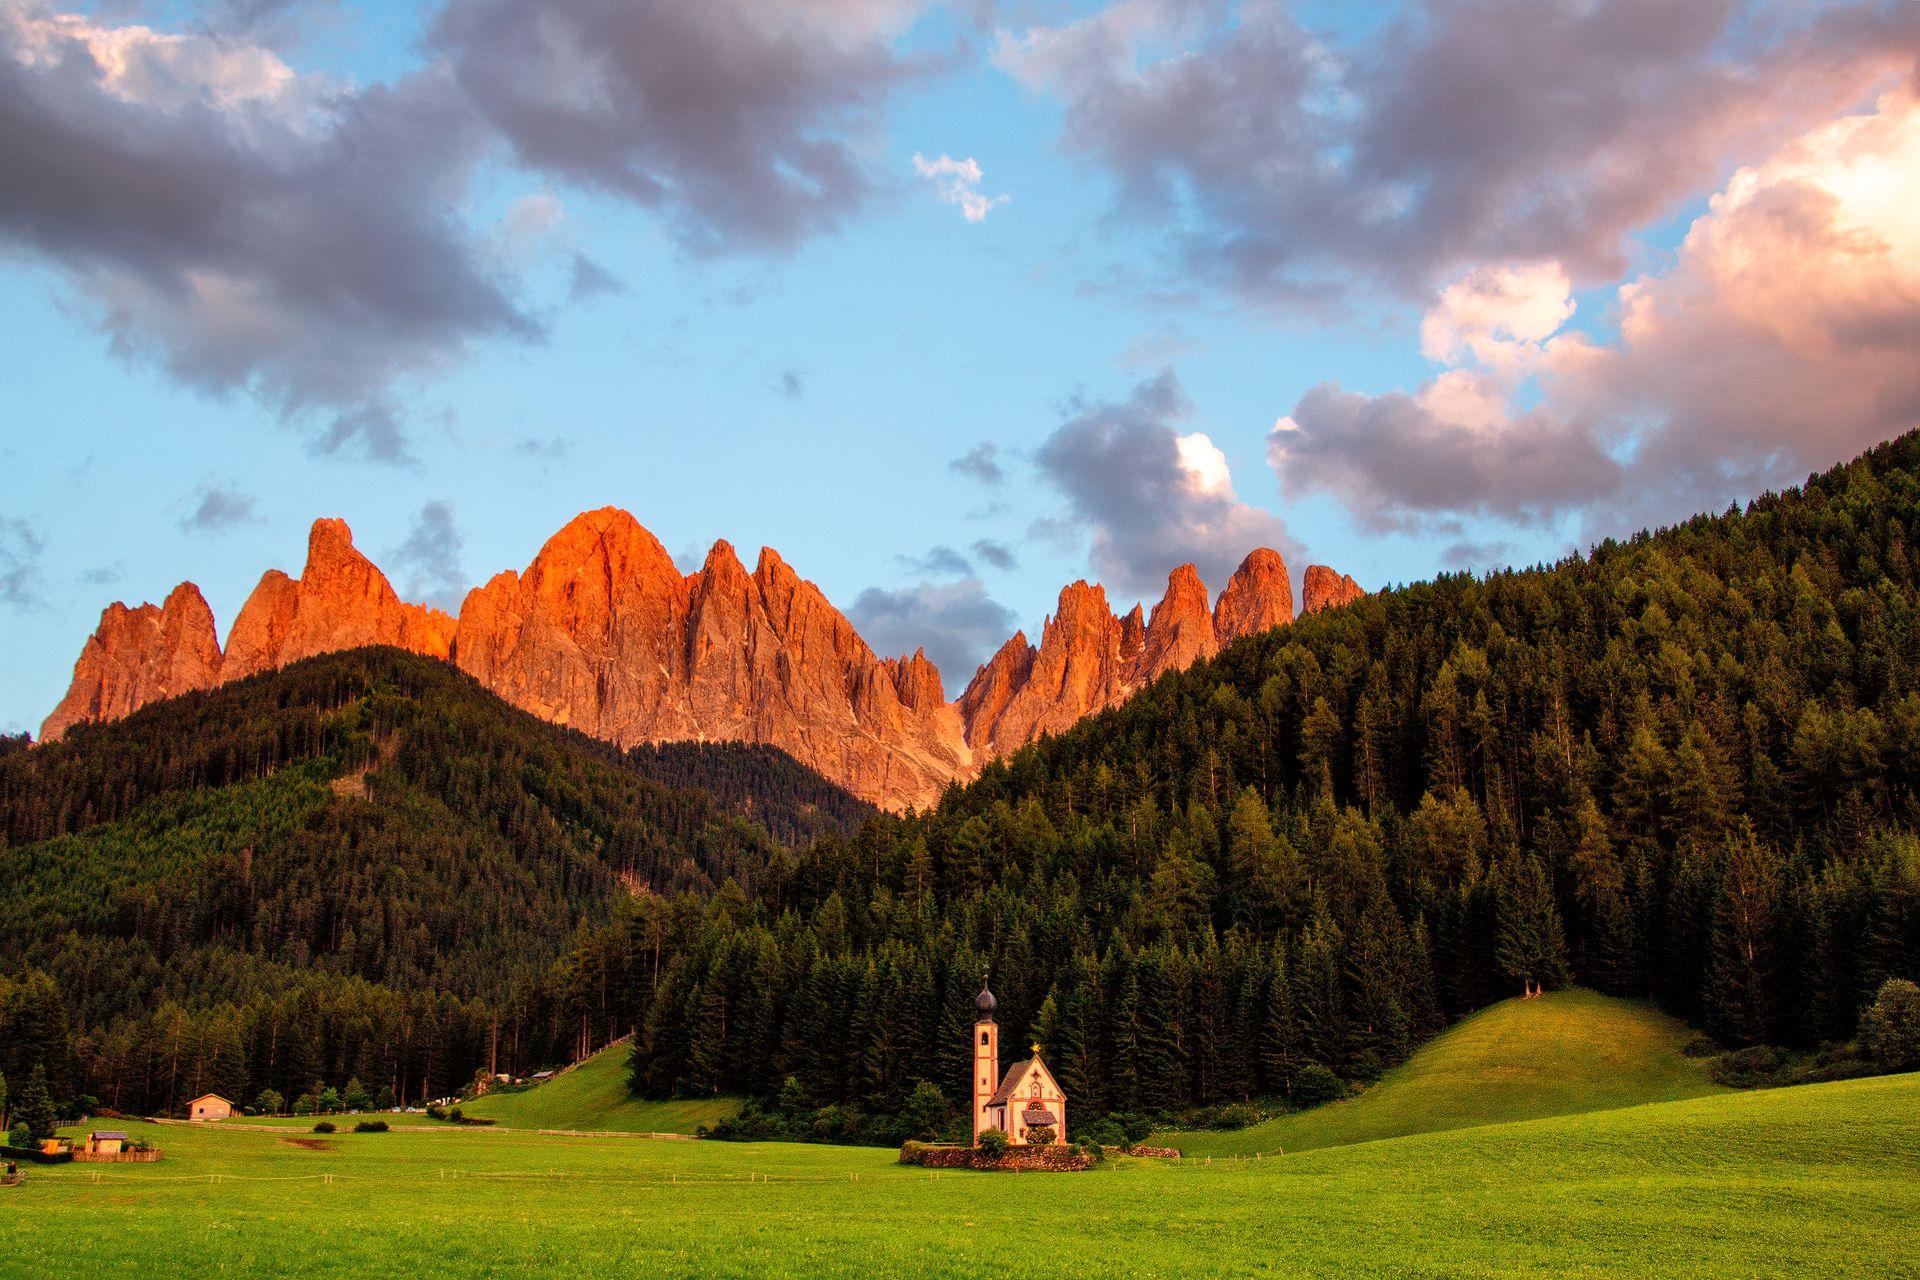 St Johann Church (San Giovanni), Puez-Geisler, Val di Funes, South Tyrol, Italy, church, sunrise, mountains, earthporn, clouds, landscape